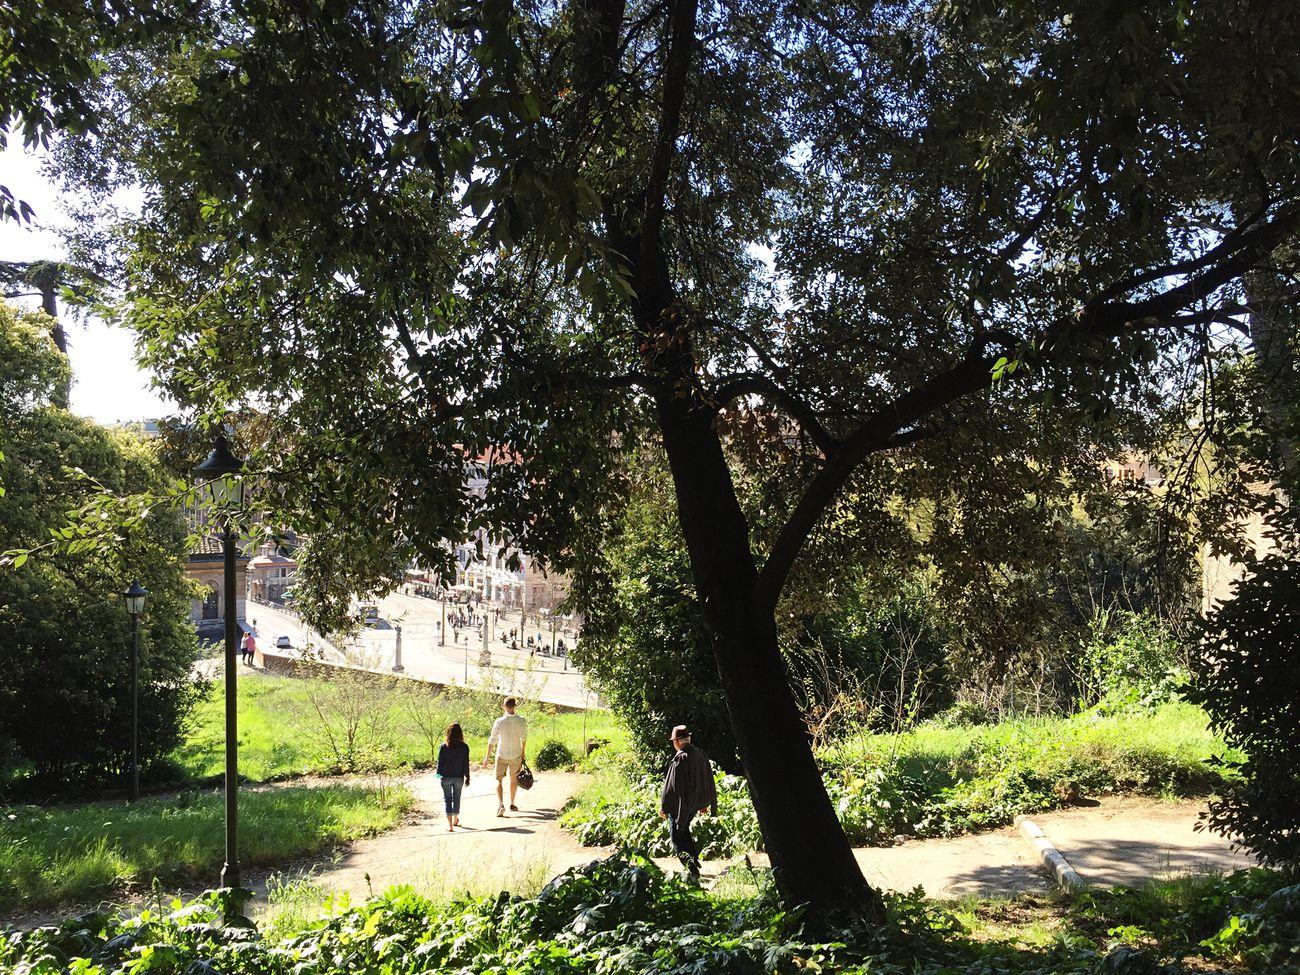 Photography People Photo Urbanphotography City Iphonephotography Iphonephoto Hi! Taking Photos Rome Trees Moments Scatti_italiani Fotografia PhonePhotography Foto Pincio Sunny Day